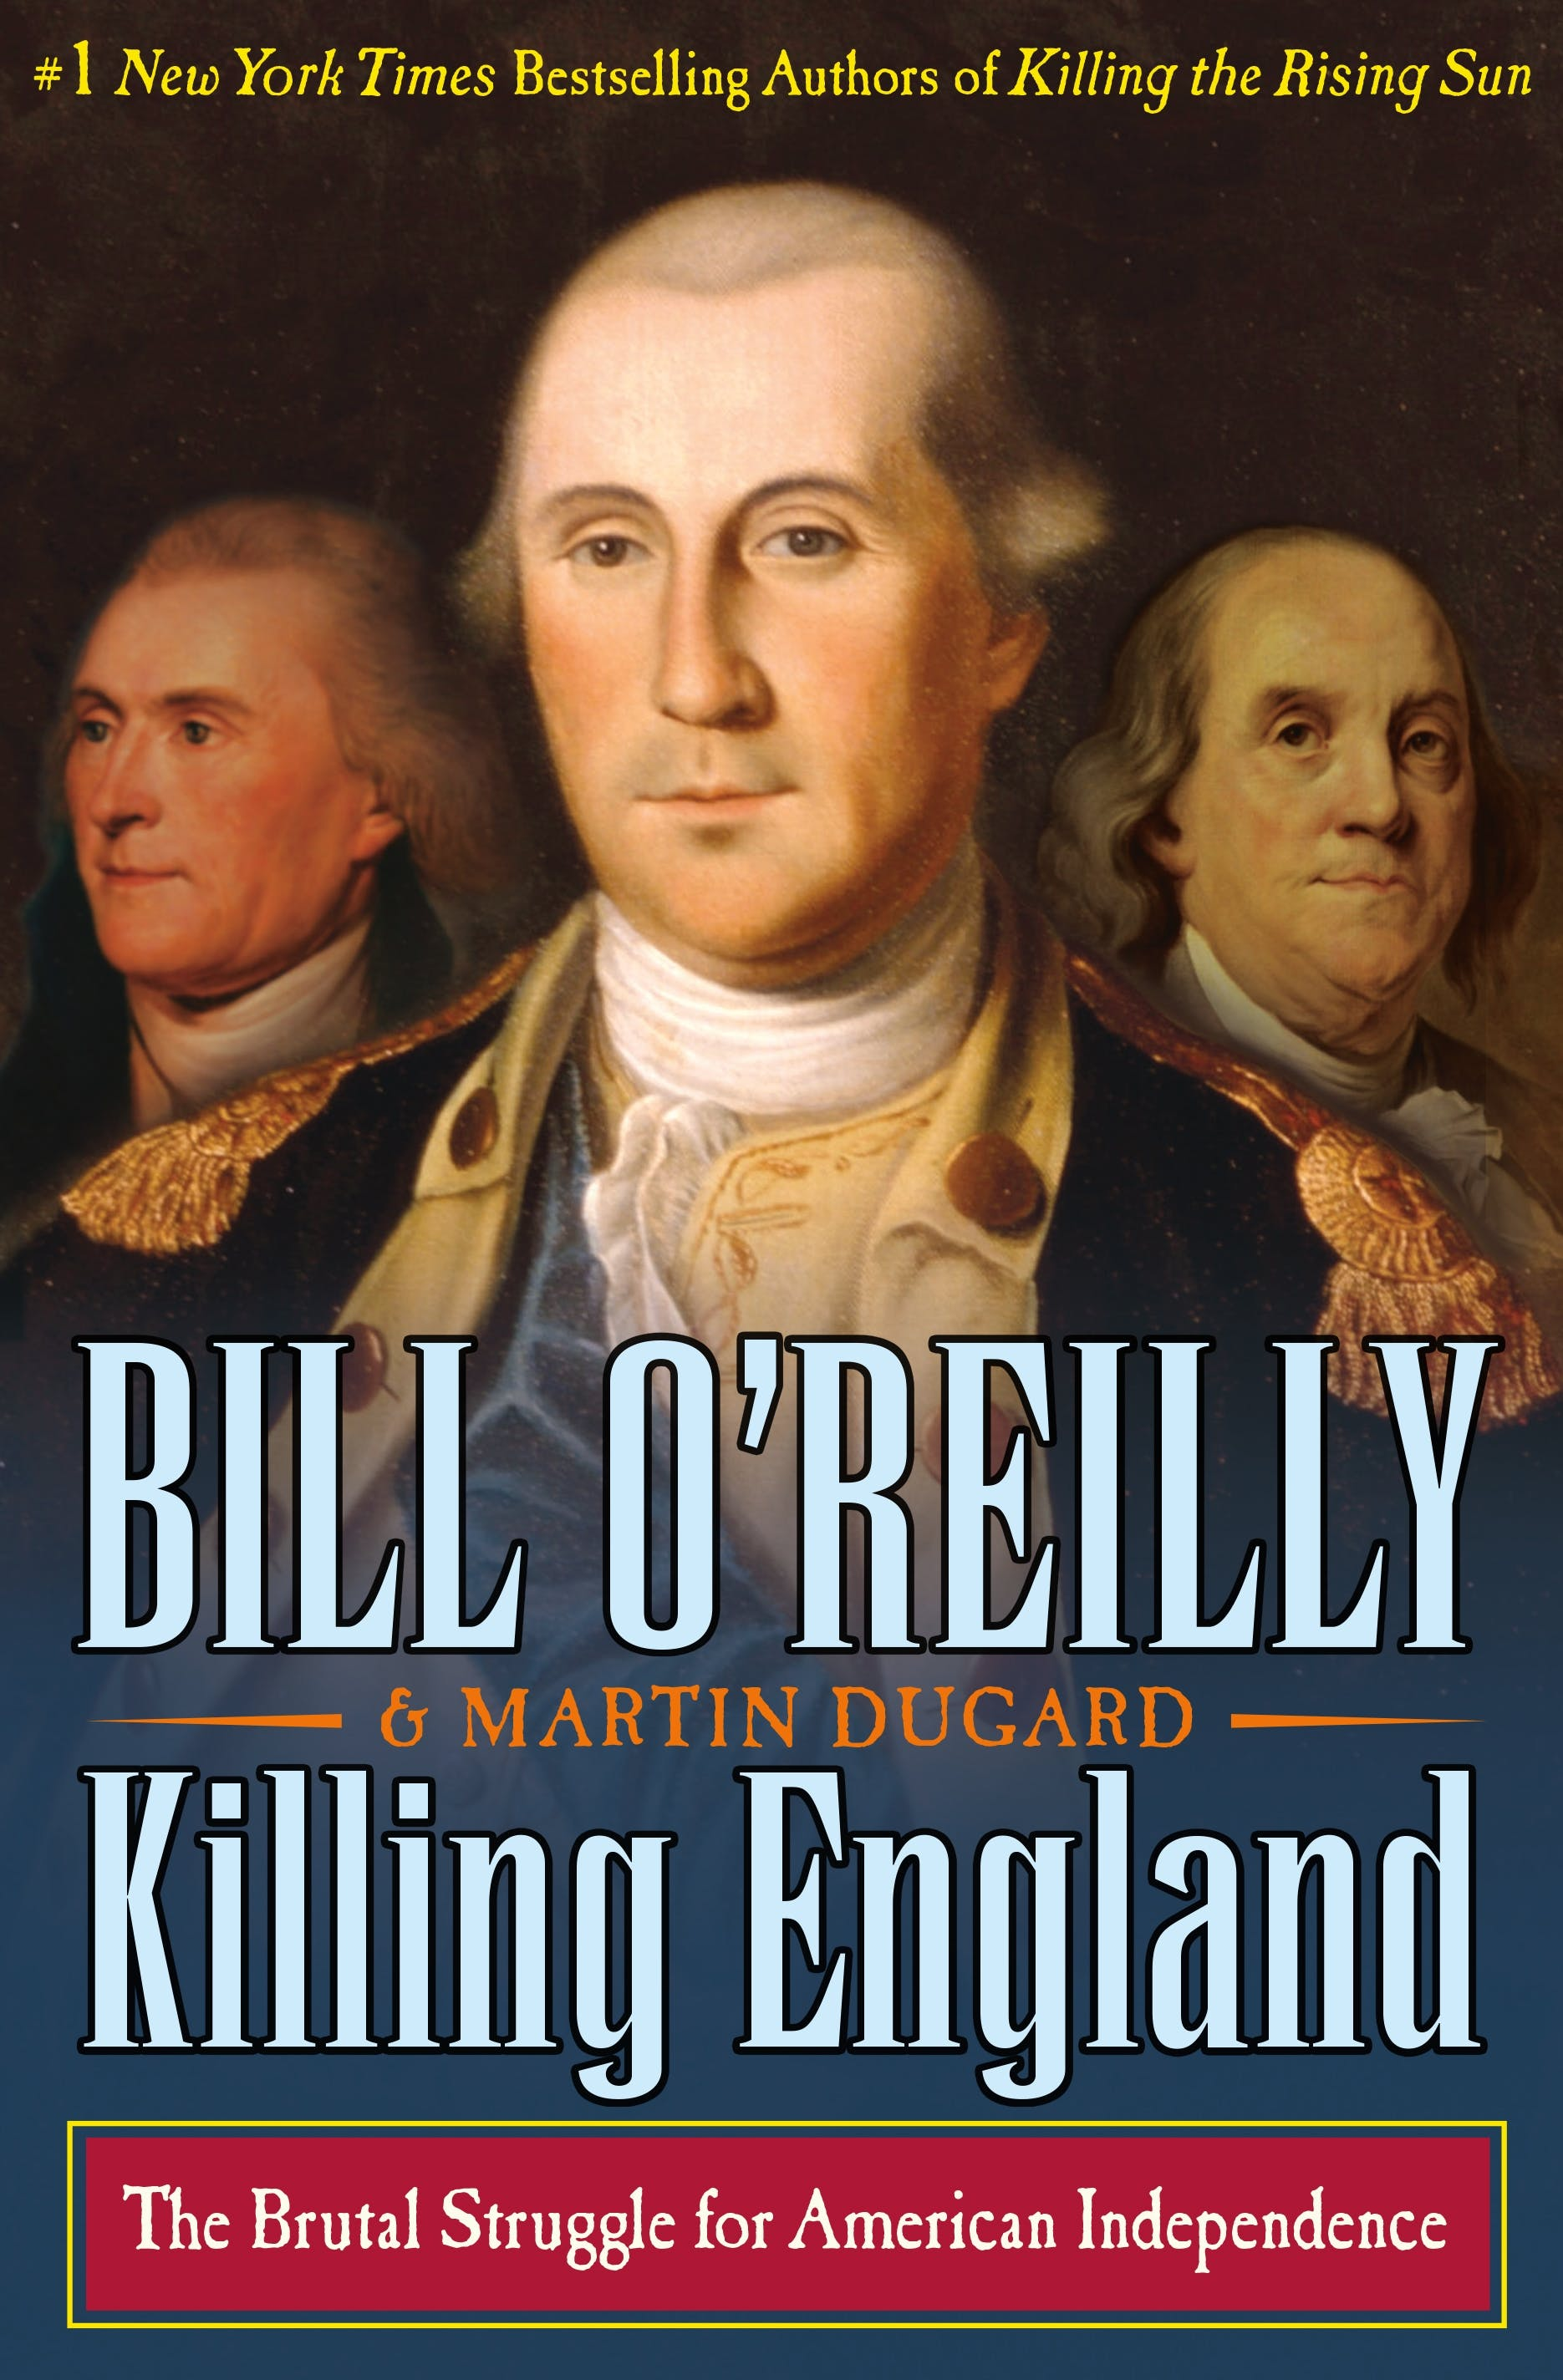 Image of Killing England